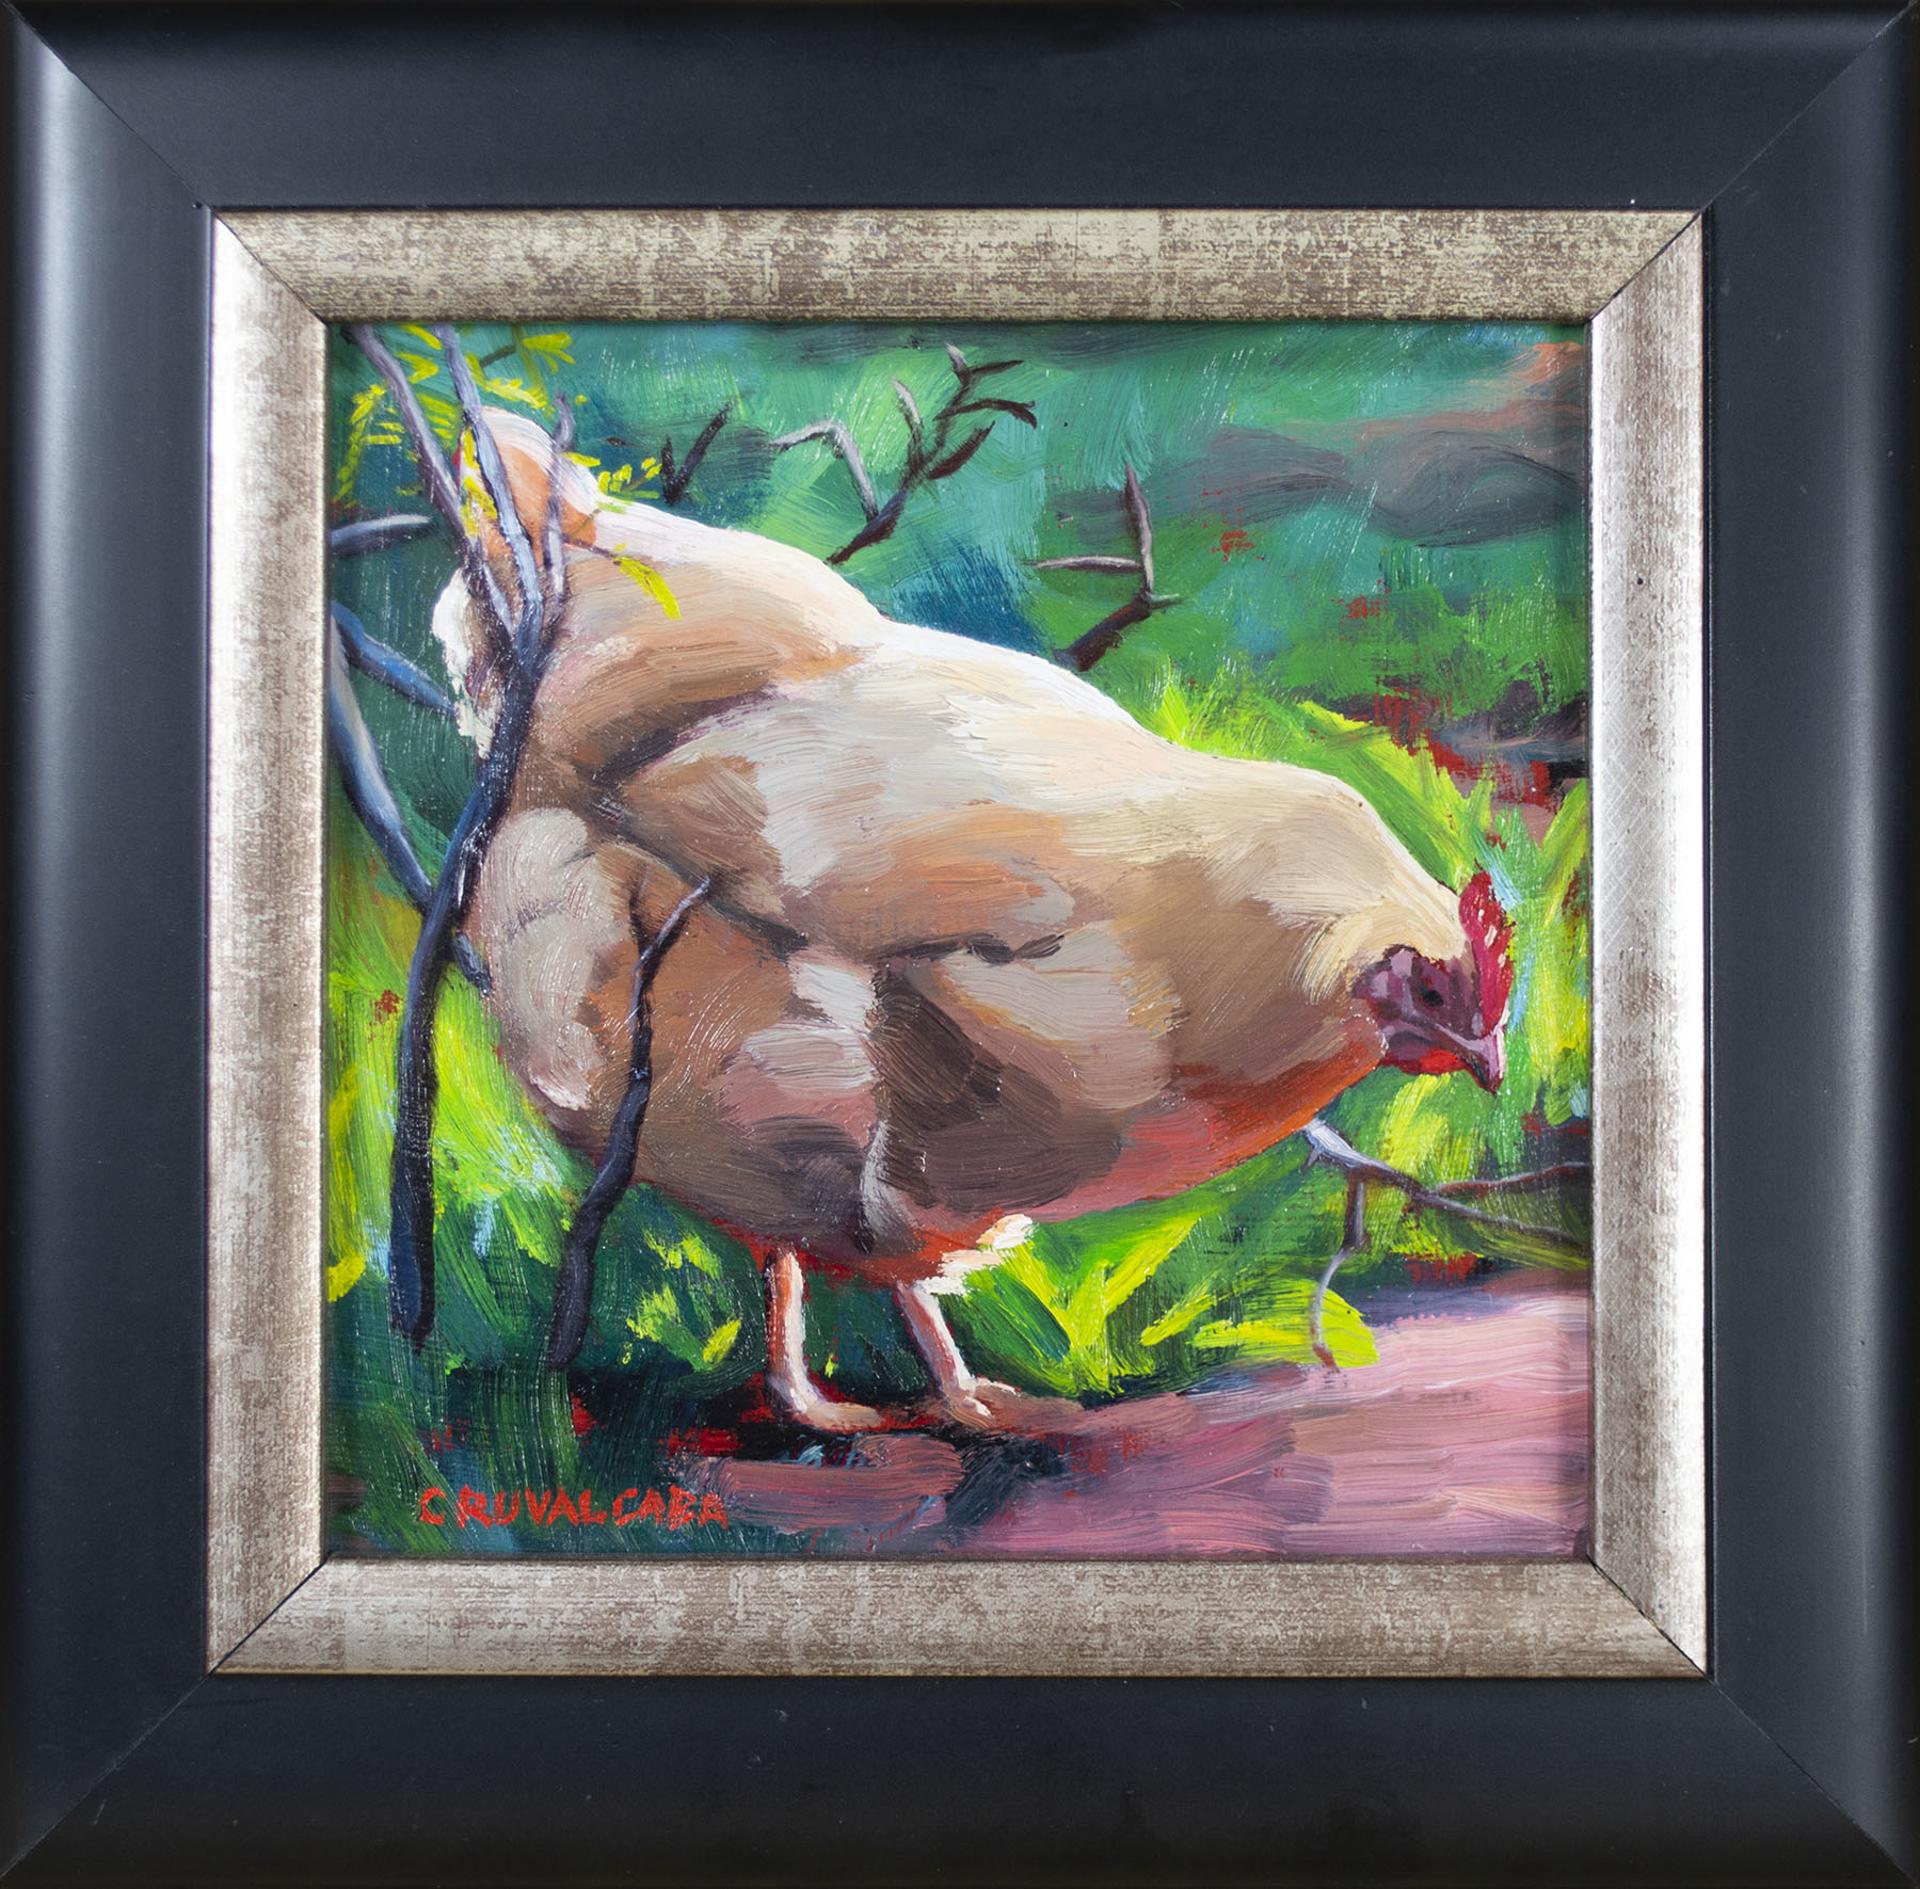 Feeling Peckish by Cathryn Ruvalcaba